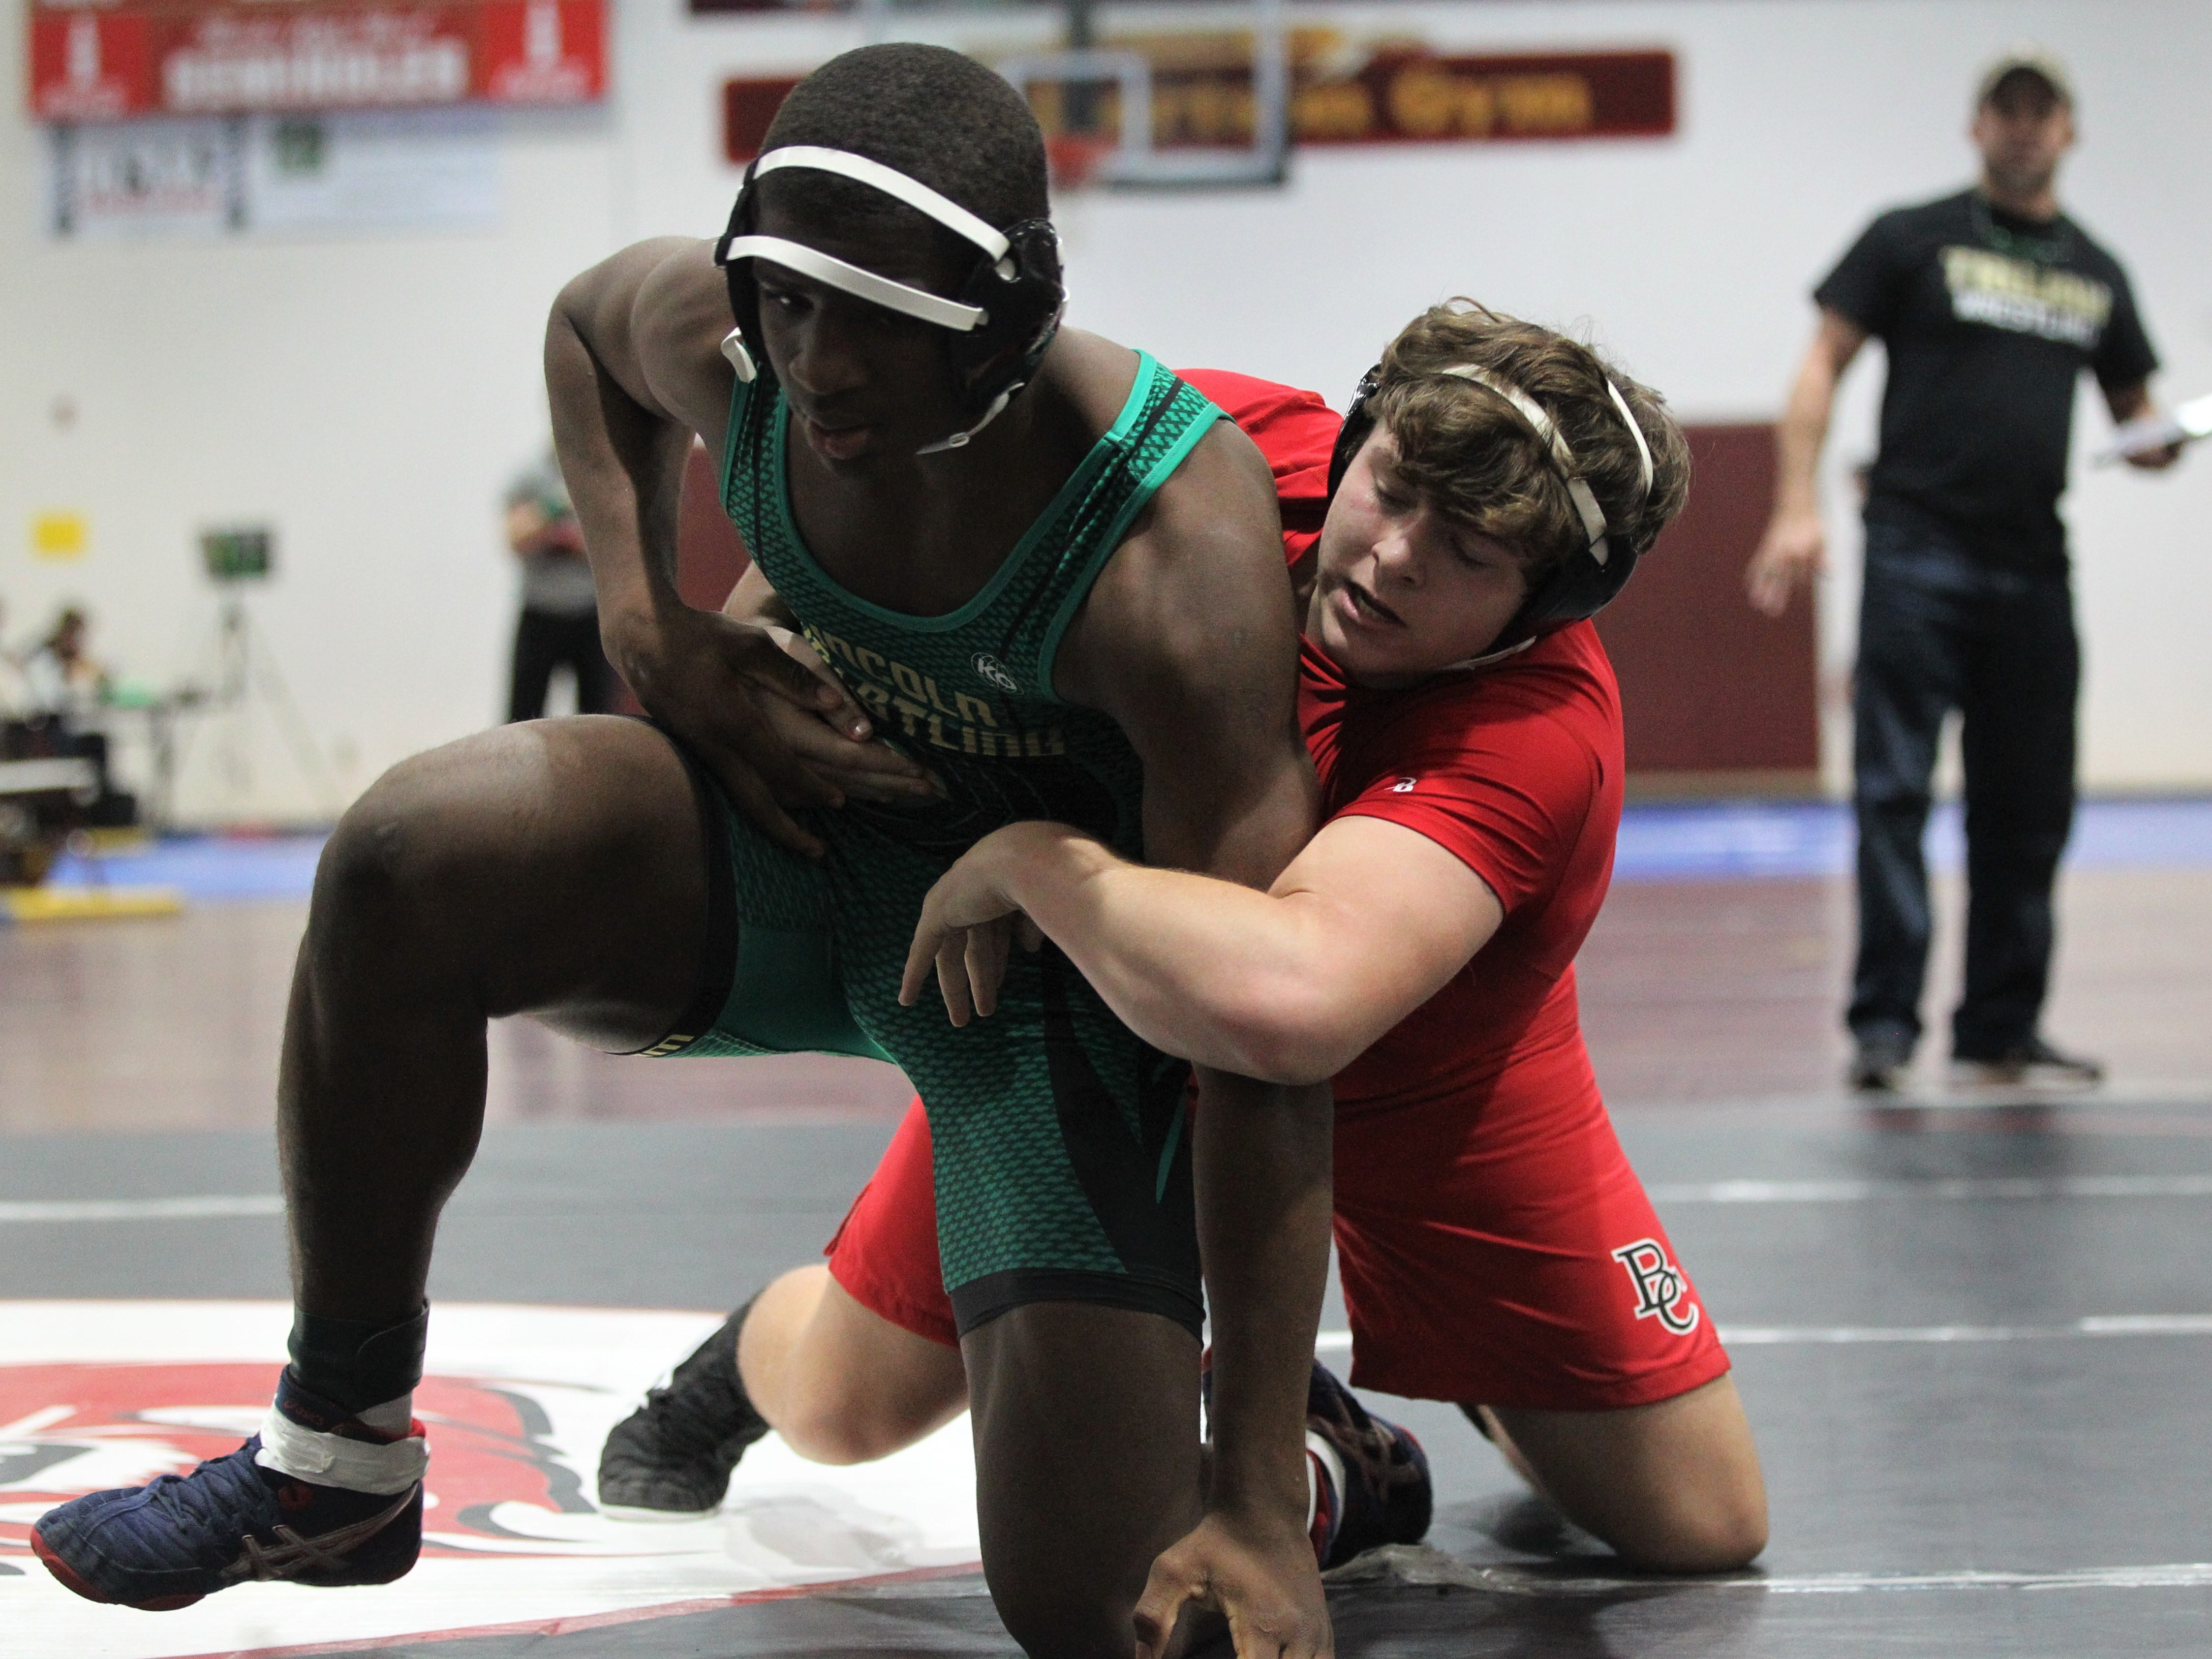 Lincoln's Tony Davis wrestles at the Cam Brown Seminole Classic wrestling tournament at Florida High on Dec. 7-8, 2018.